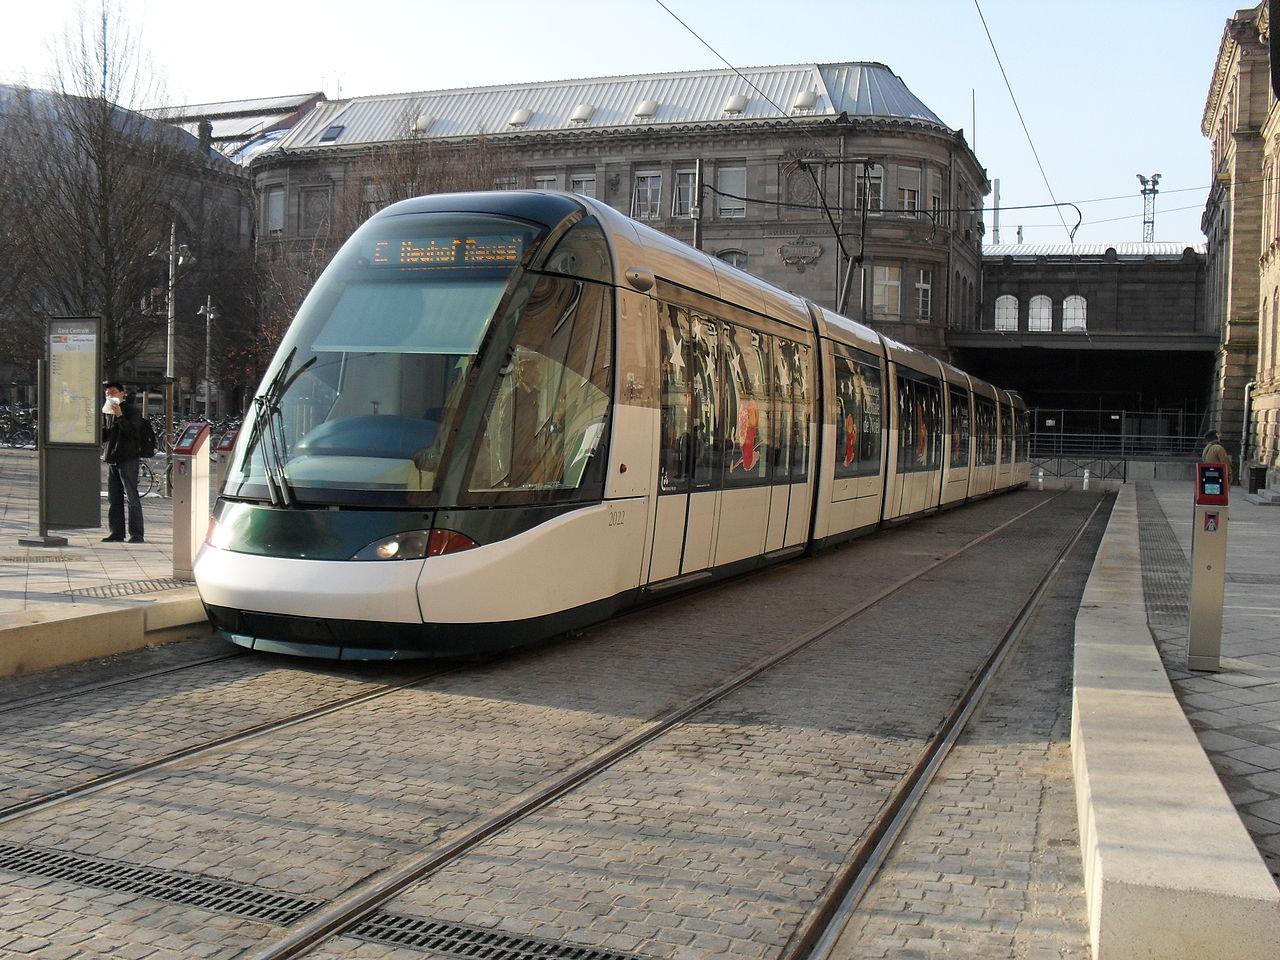 1280px-TramStrasbourg_lineC_GareCentrale2